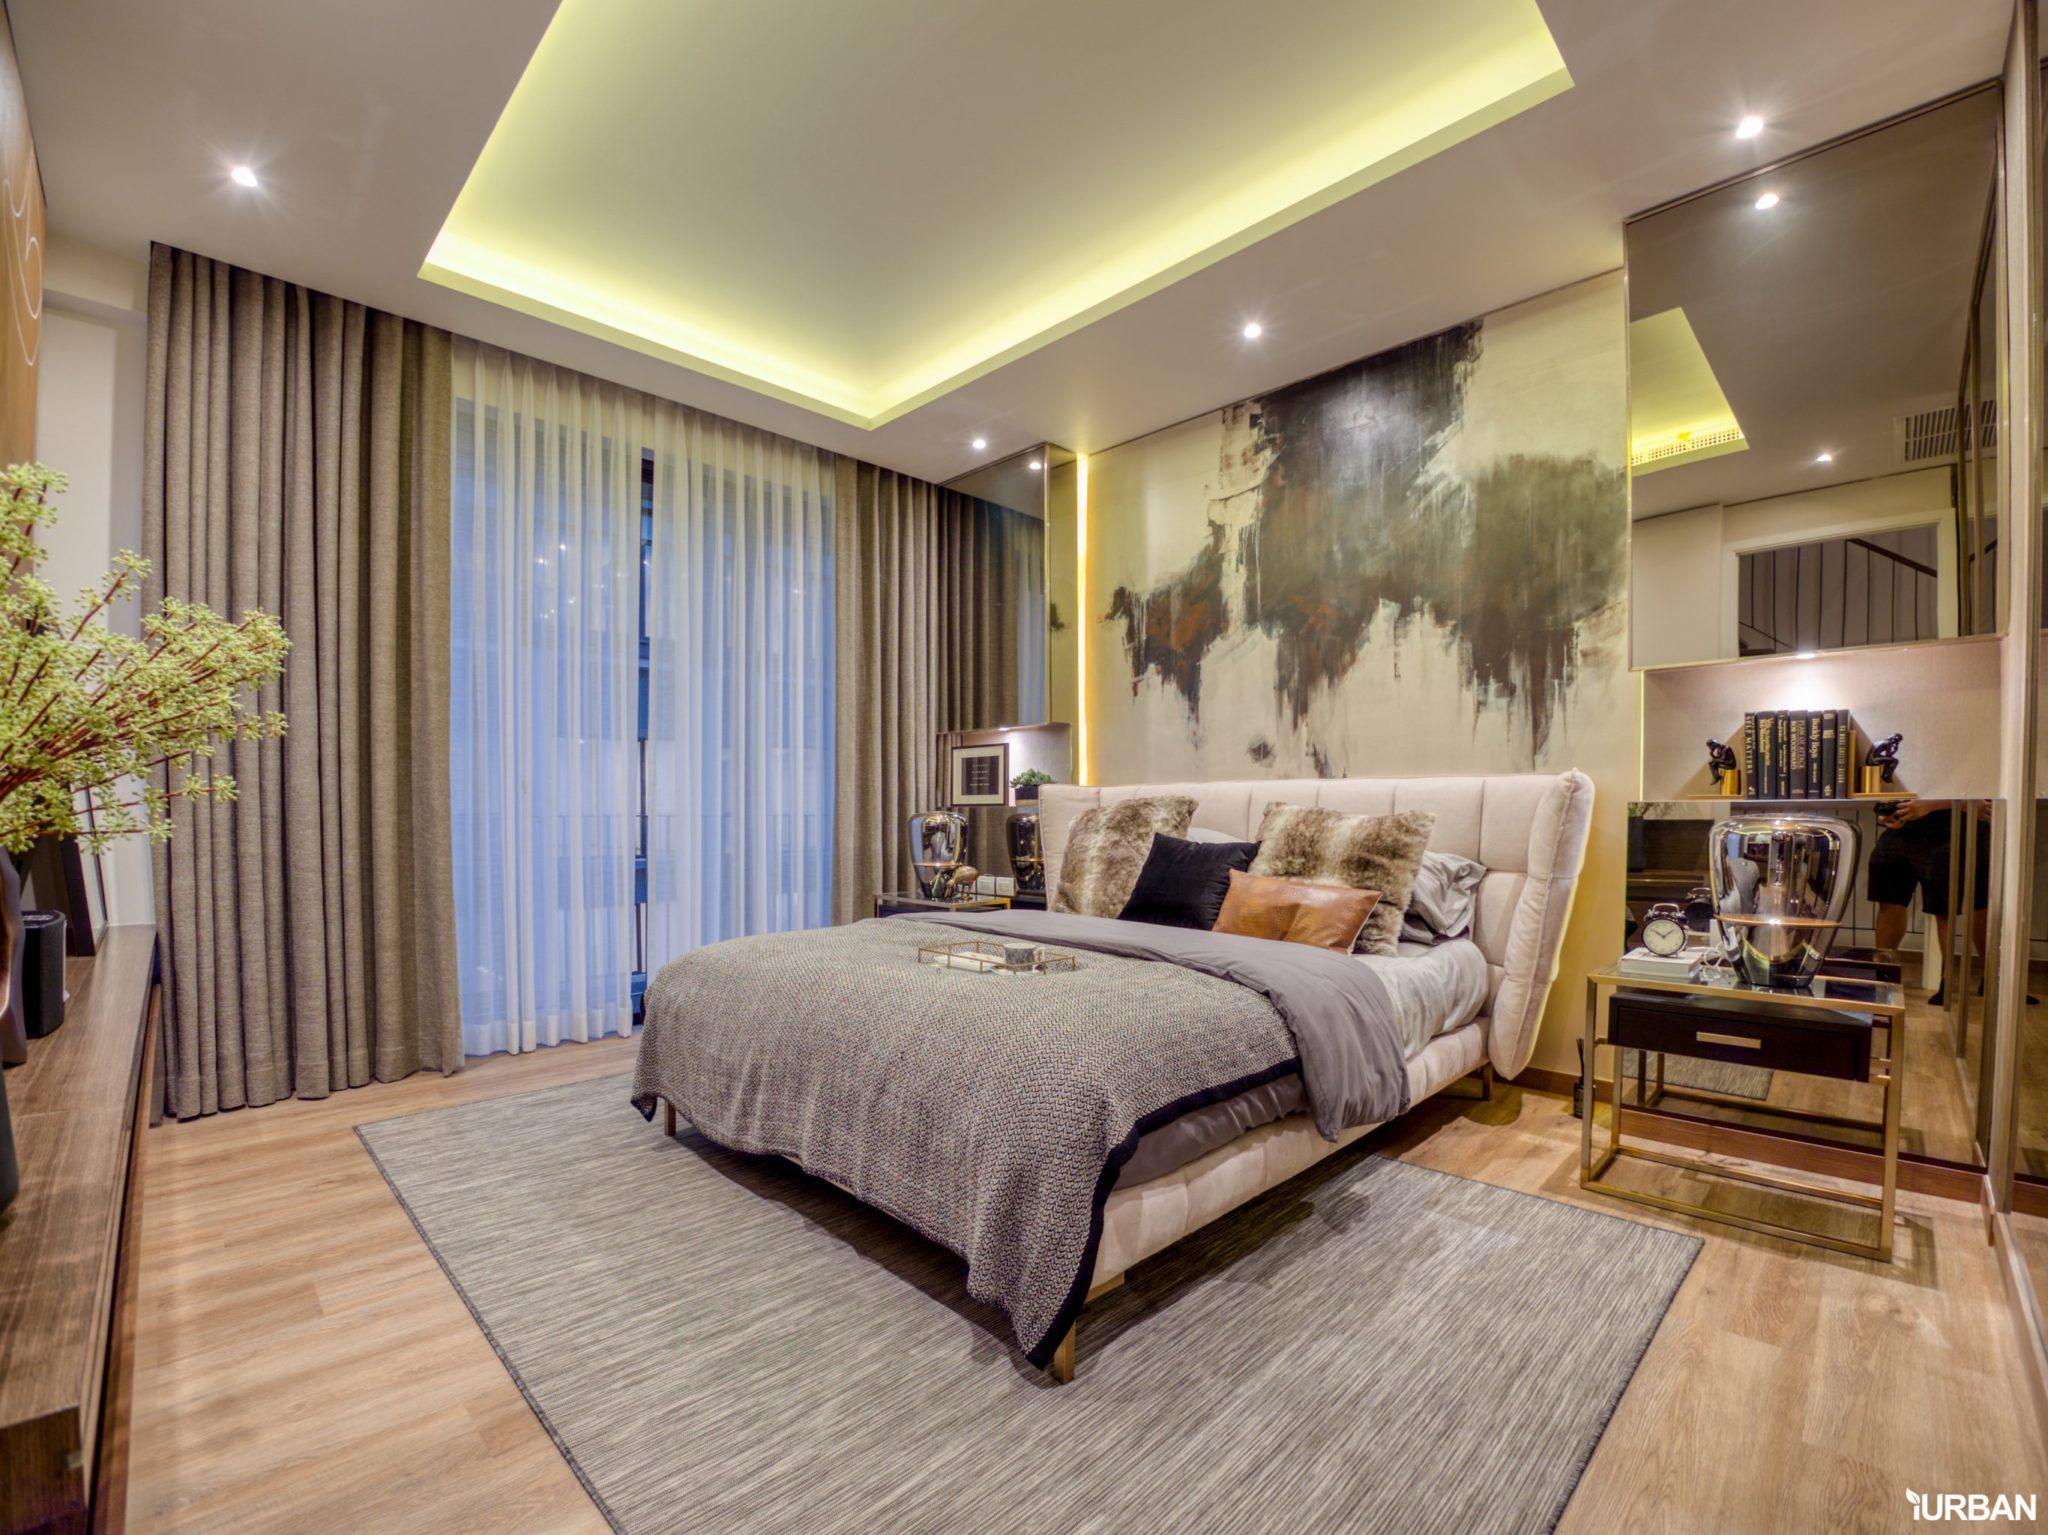 AIRES RAMA9 รีวิว Luxury Townhome 3.5 ชั้น + Rooftop ออกแบบสวย ย่านพระราม9 (ใกล้ รพ.สมิติเวช) 49 - AIRES